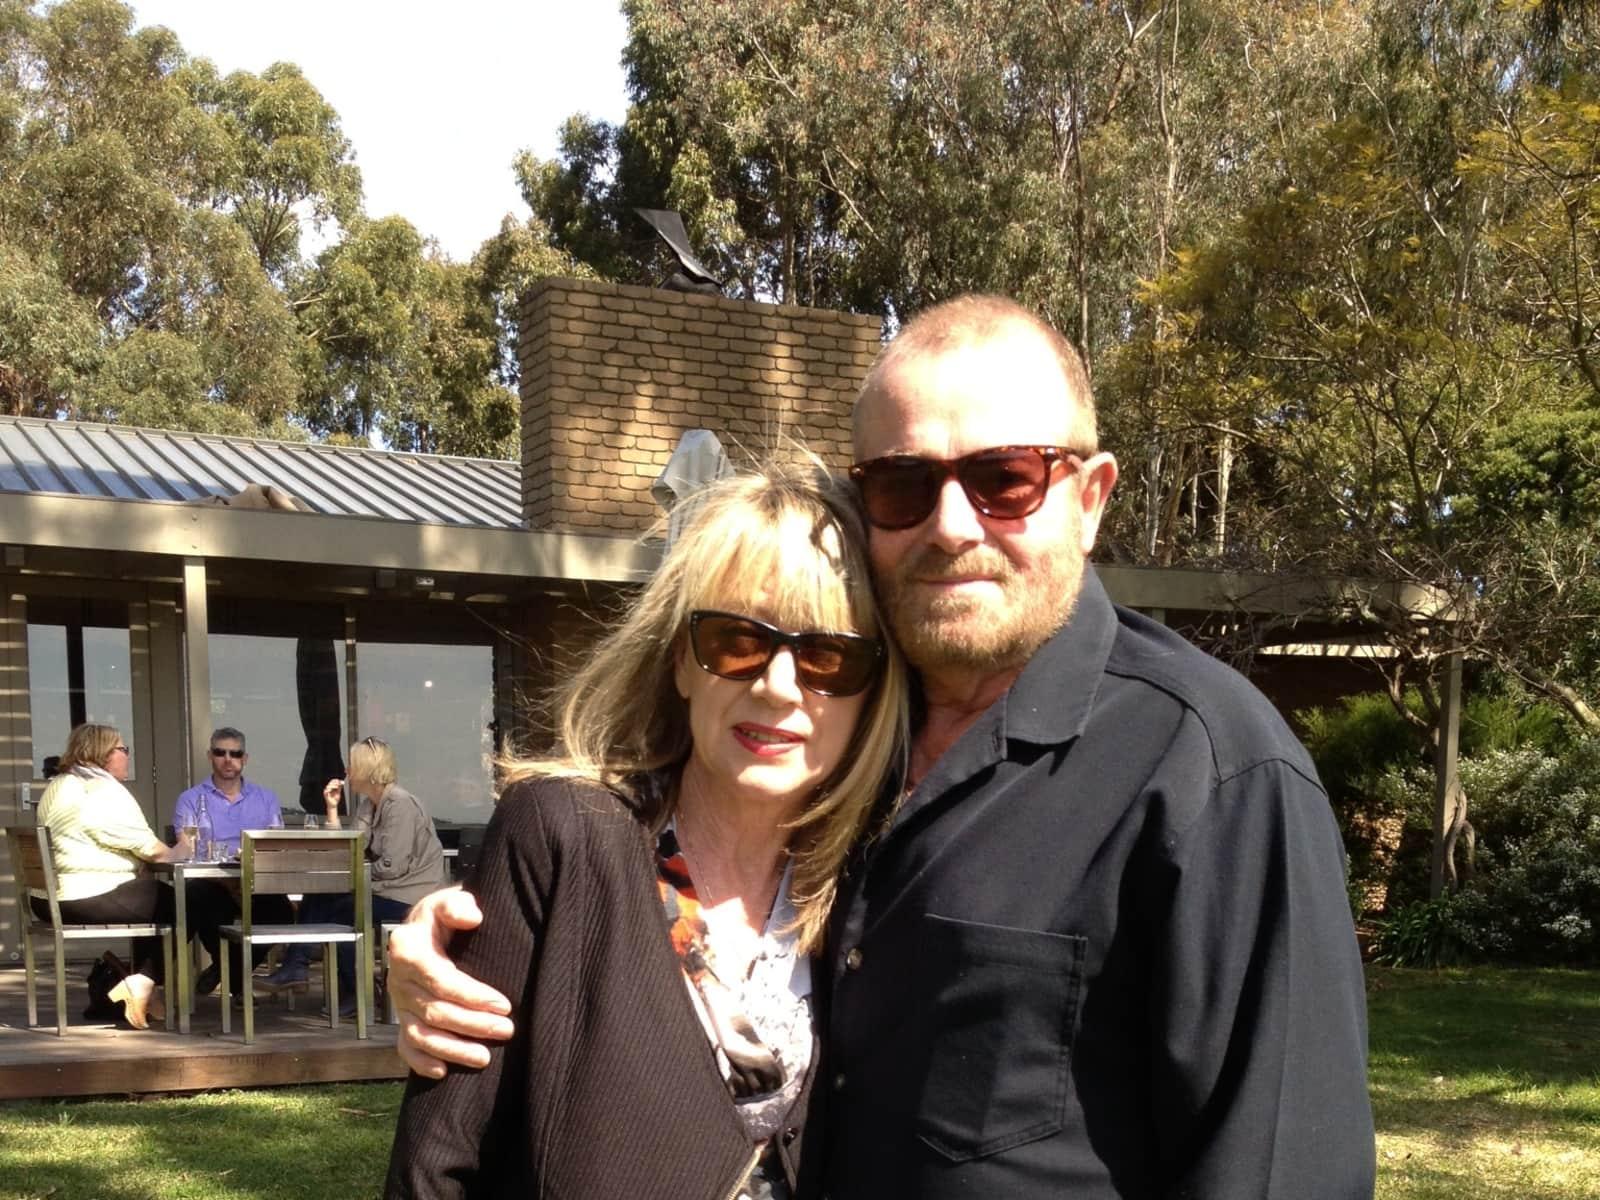 Susan & Antony from Melbourne, Victoria, Australia